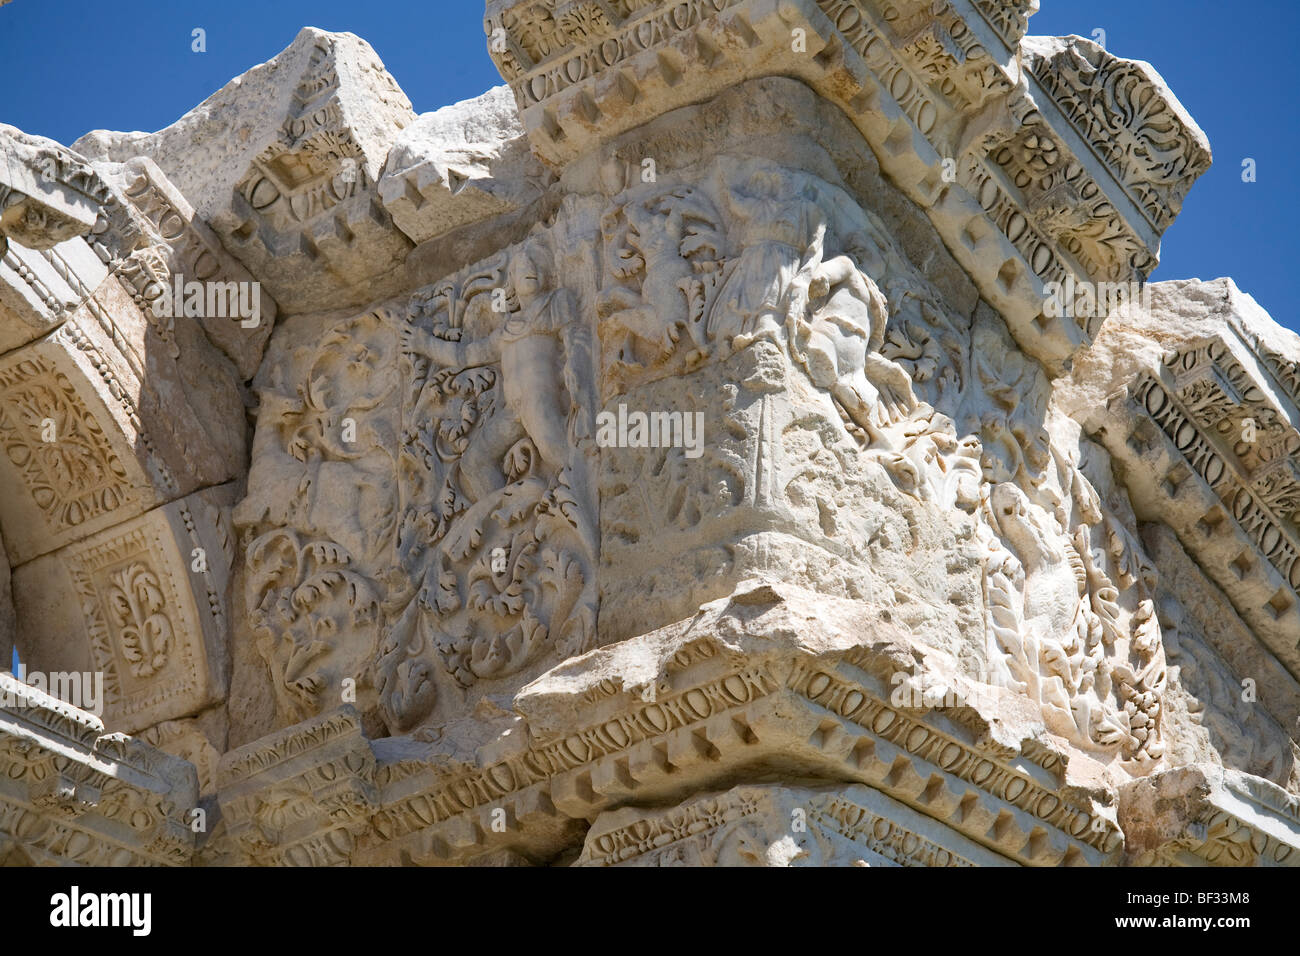 Turkey, Aphrodisias - Tetrapylon, western pediment, east end, decorative entablature - Stock Image